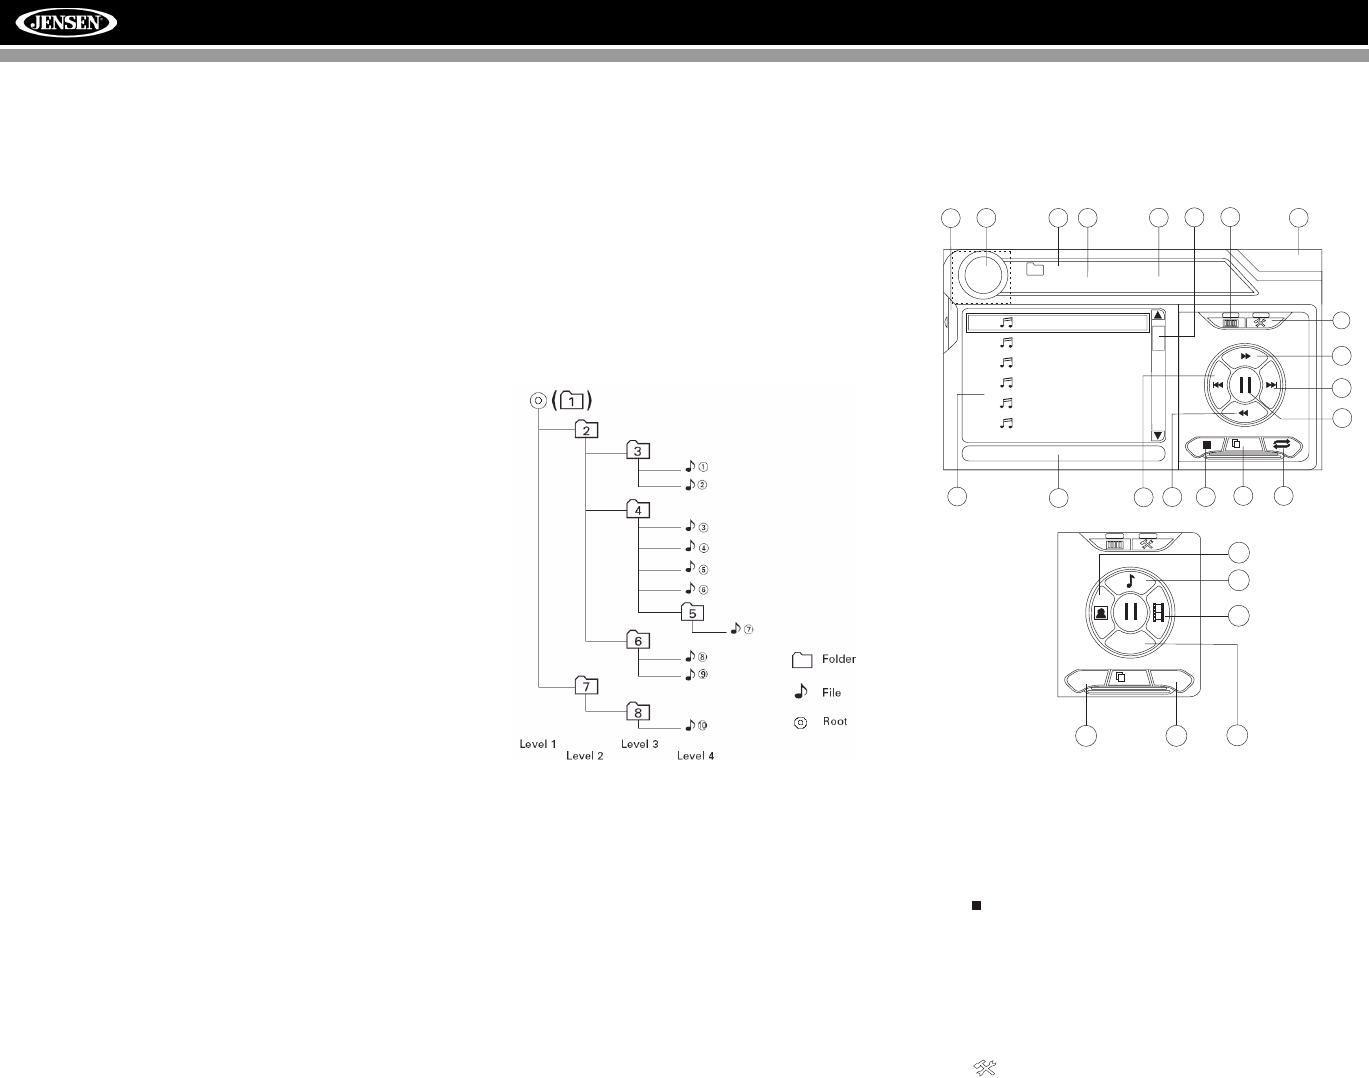 Brilliant Jensen Vm9412 Wiring Diagram Basic Electronics Wiring Diagram Wiring Digital Resources Jebrpcompassionincorg